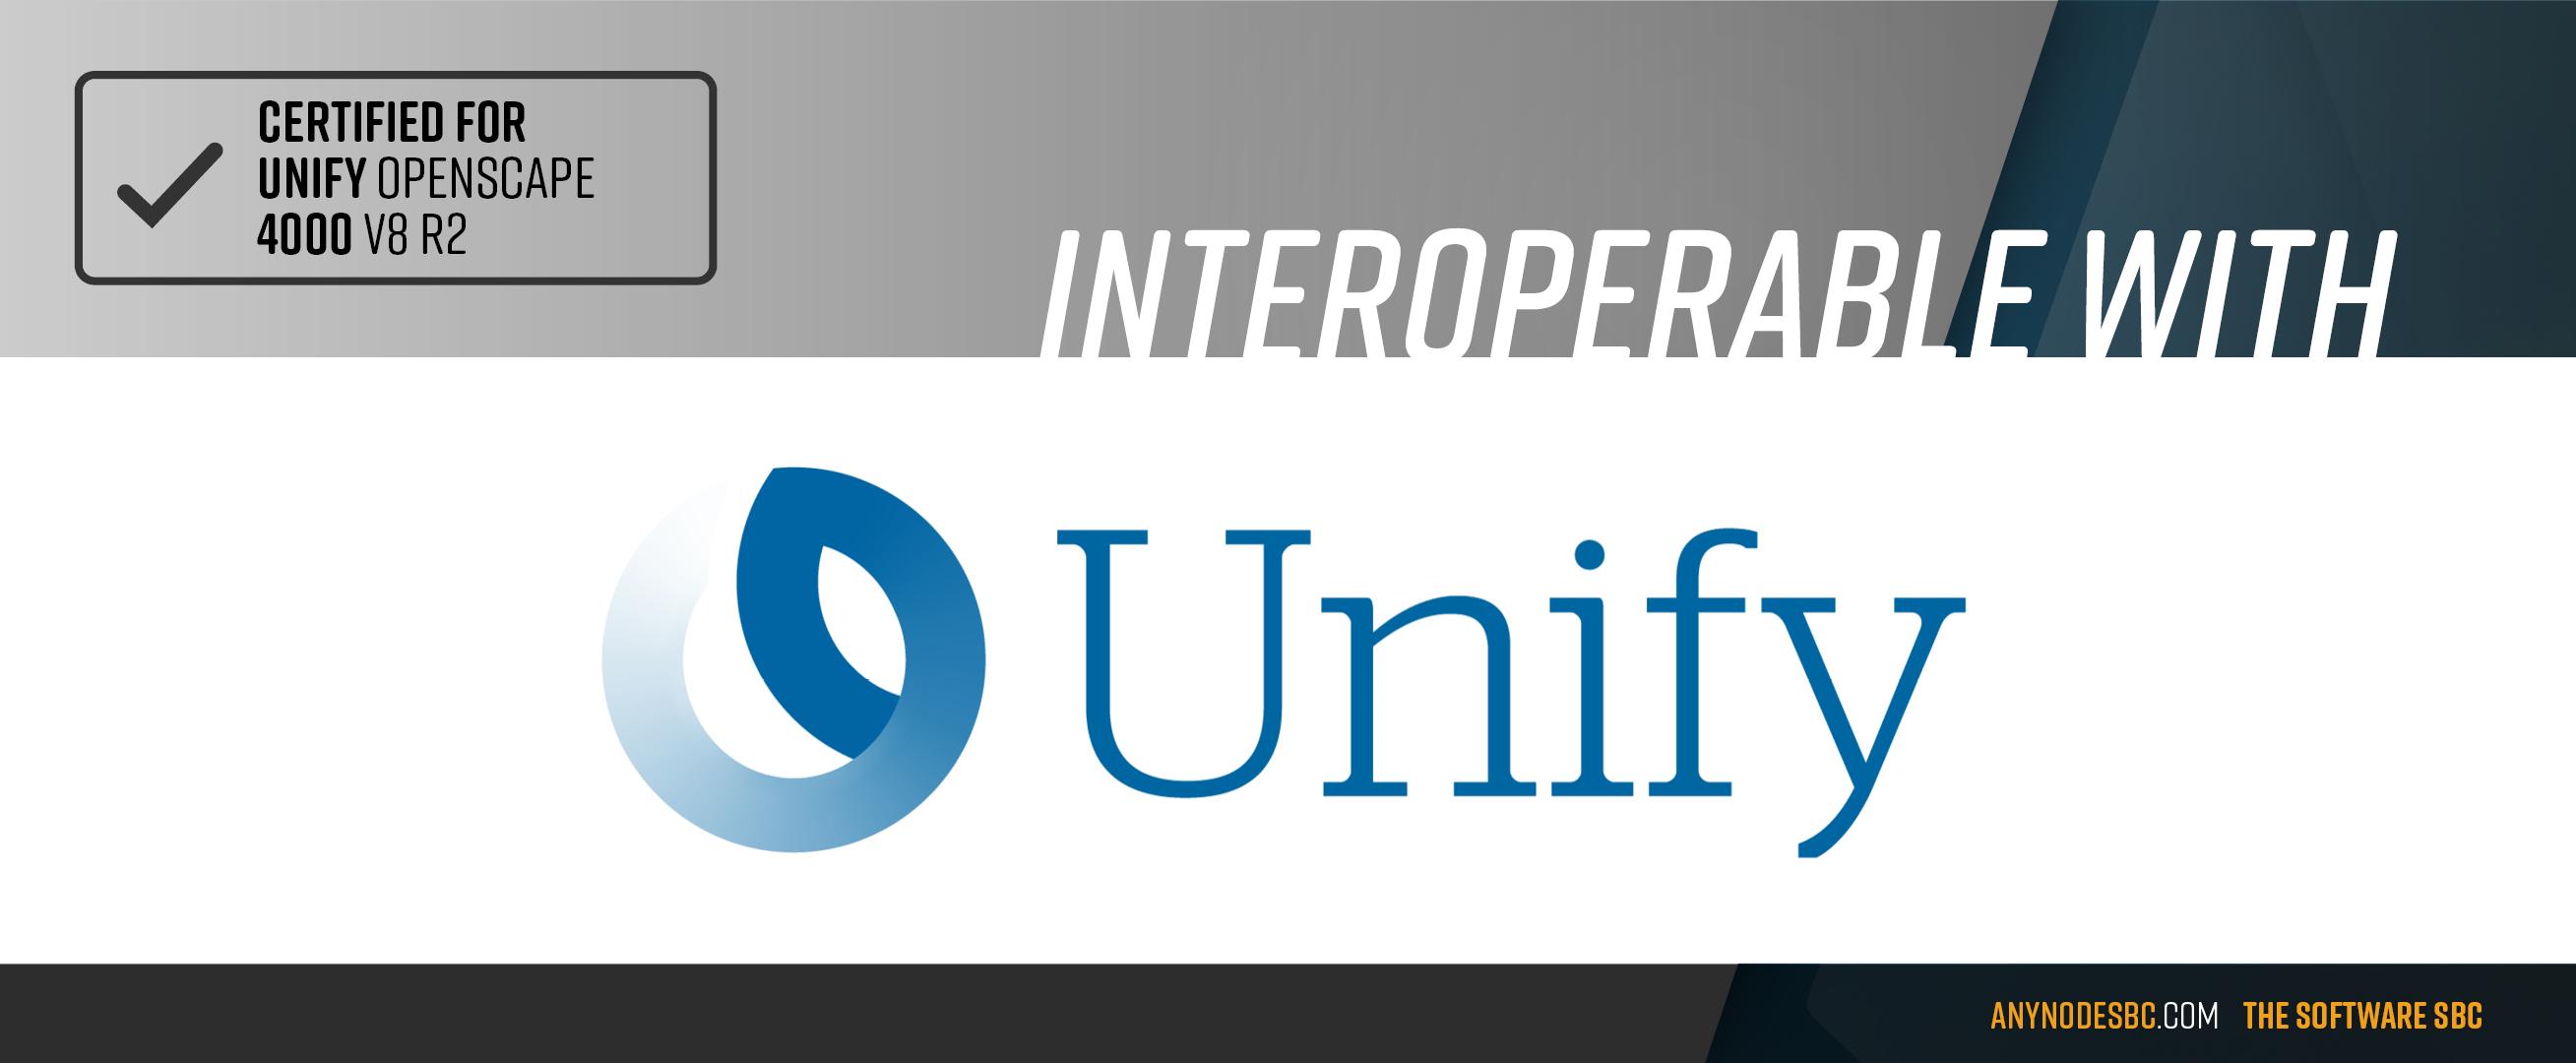 TE-SYSTEMS anynode ist zertifiziert für Atos Unify Open Scape 4000 V8 R2